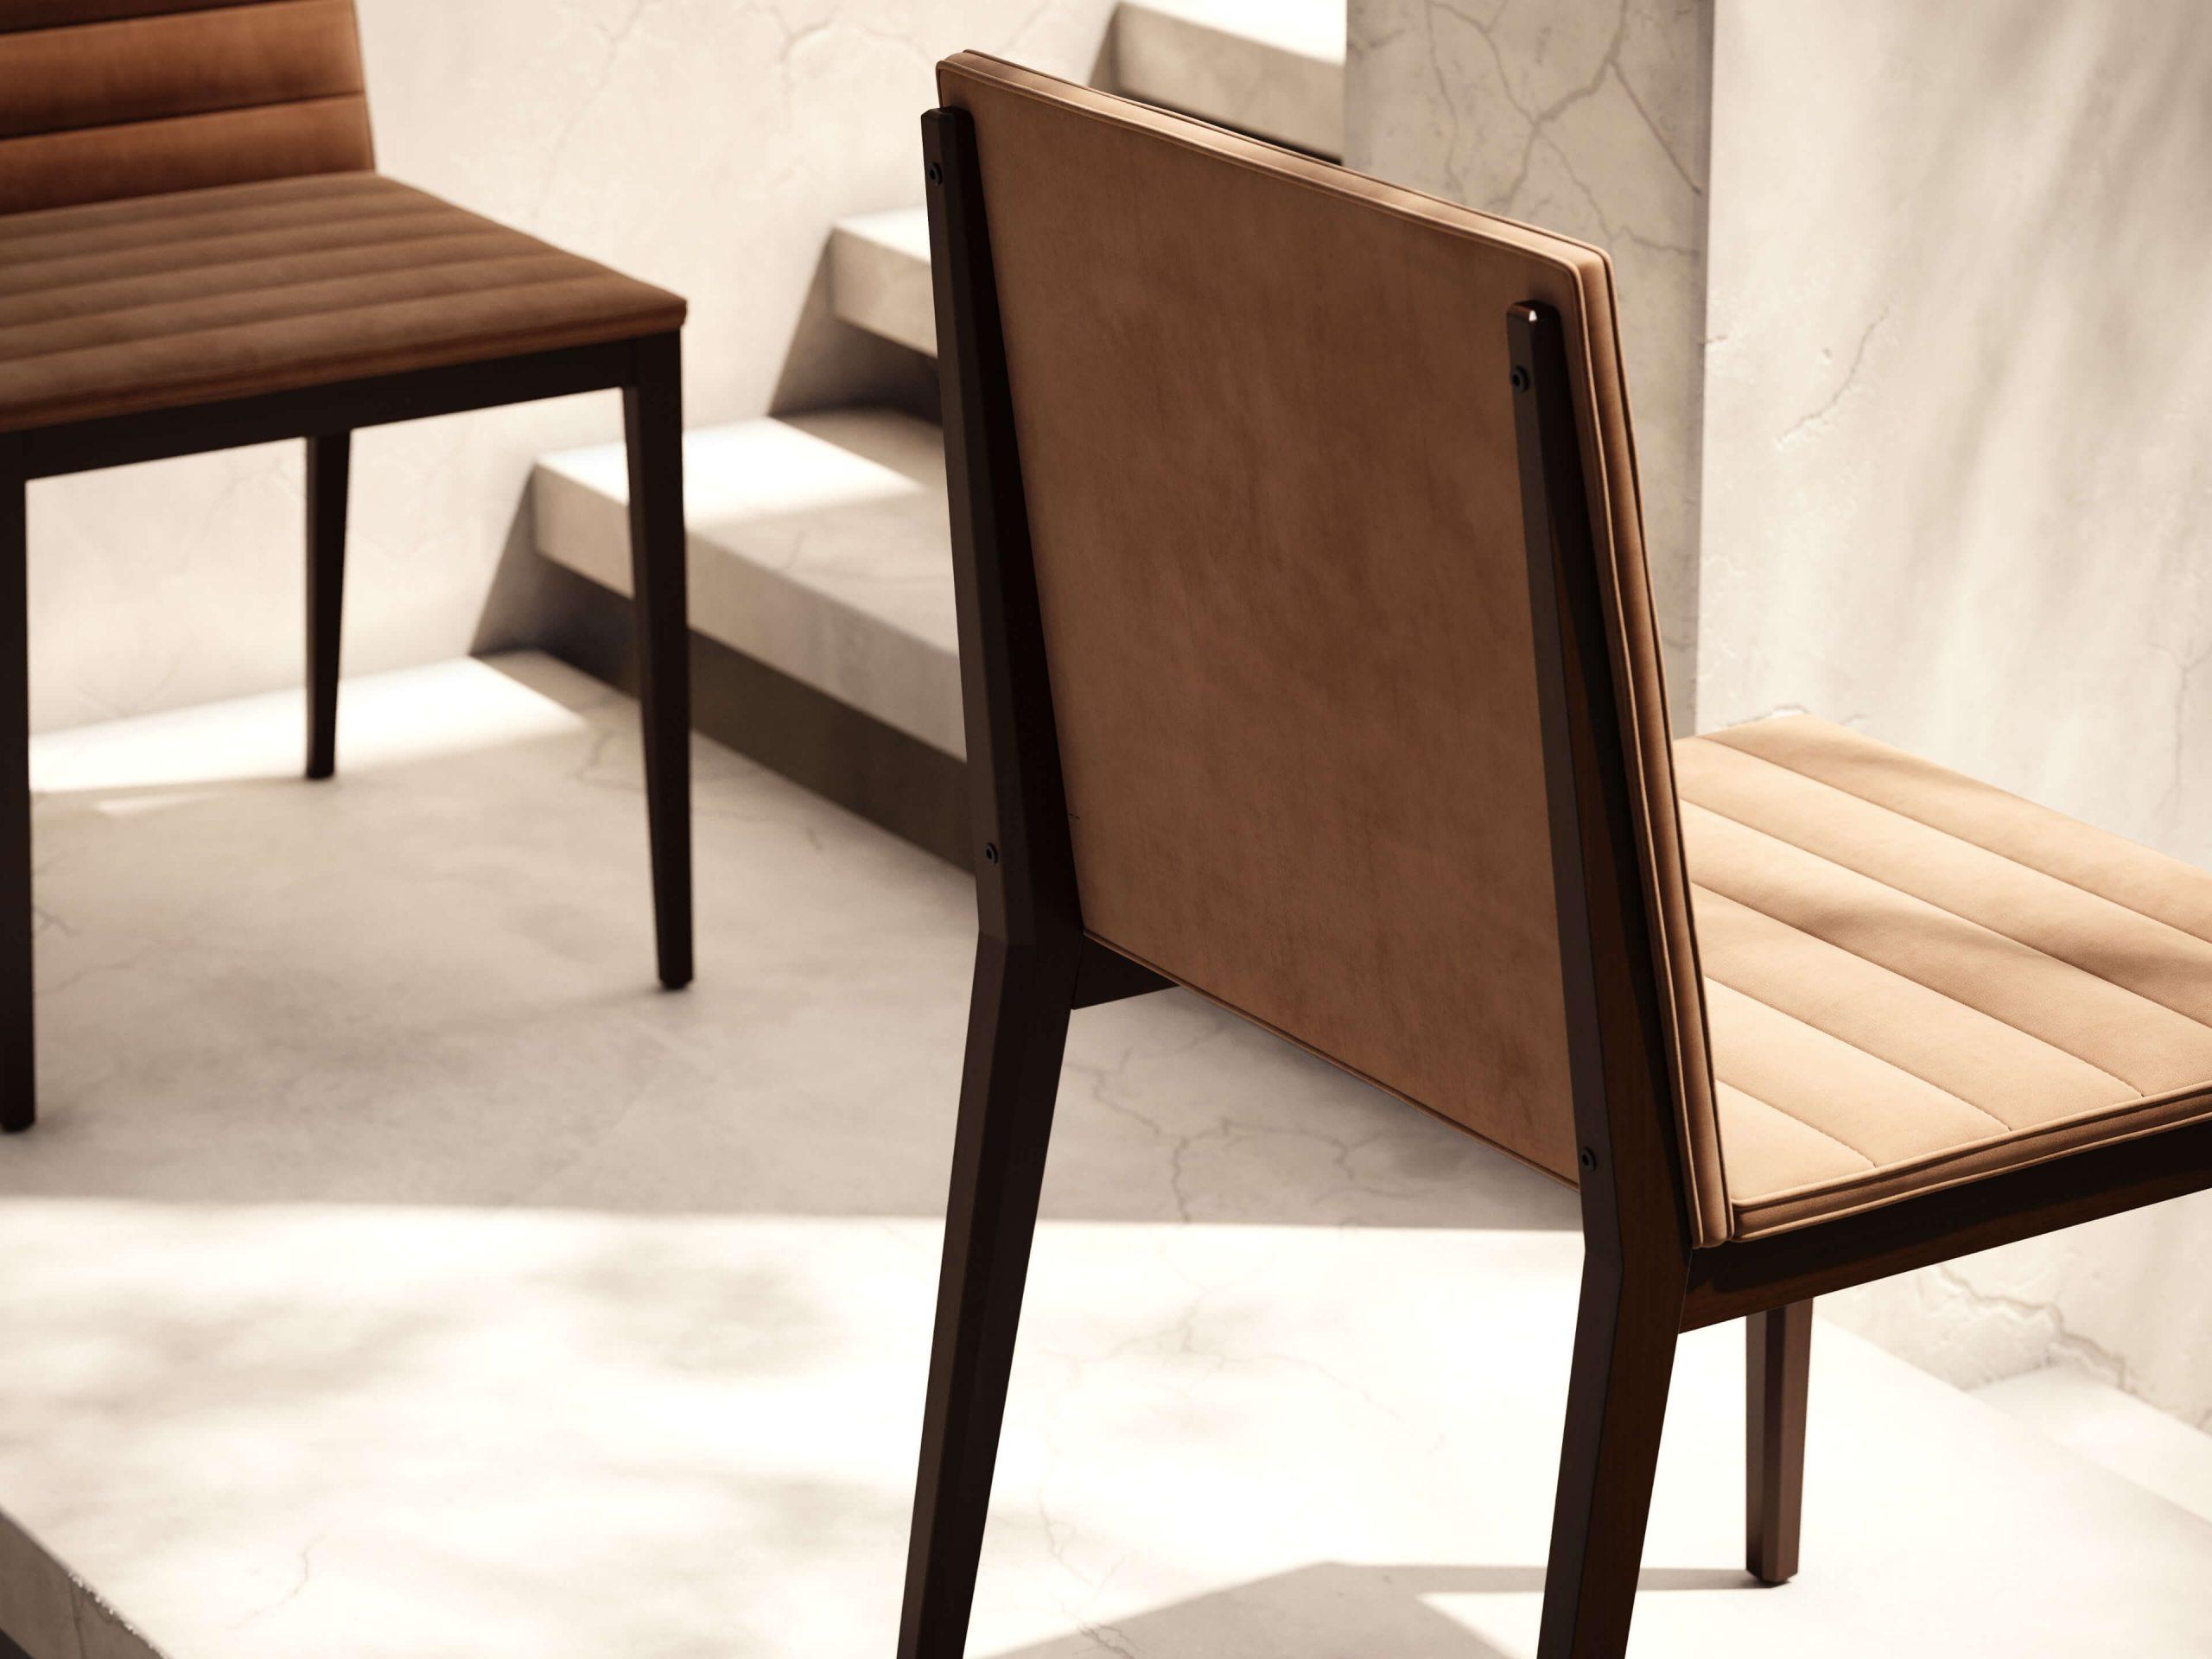 essential-chair-brown-velvet-dining-chair-domkapa